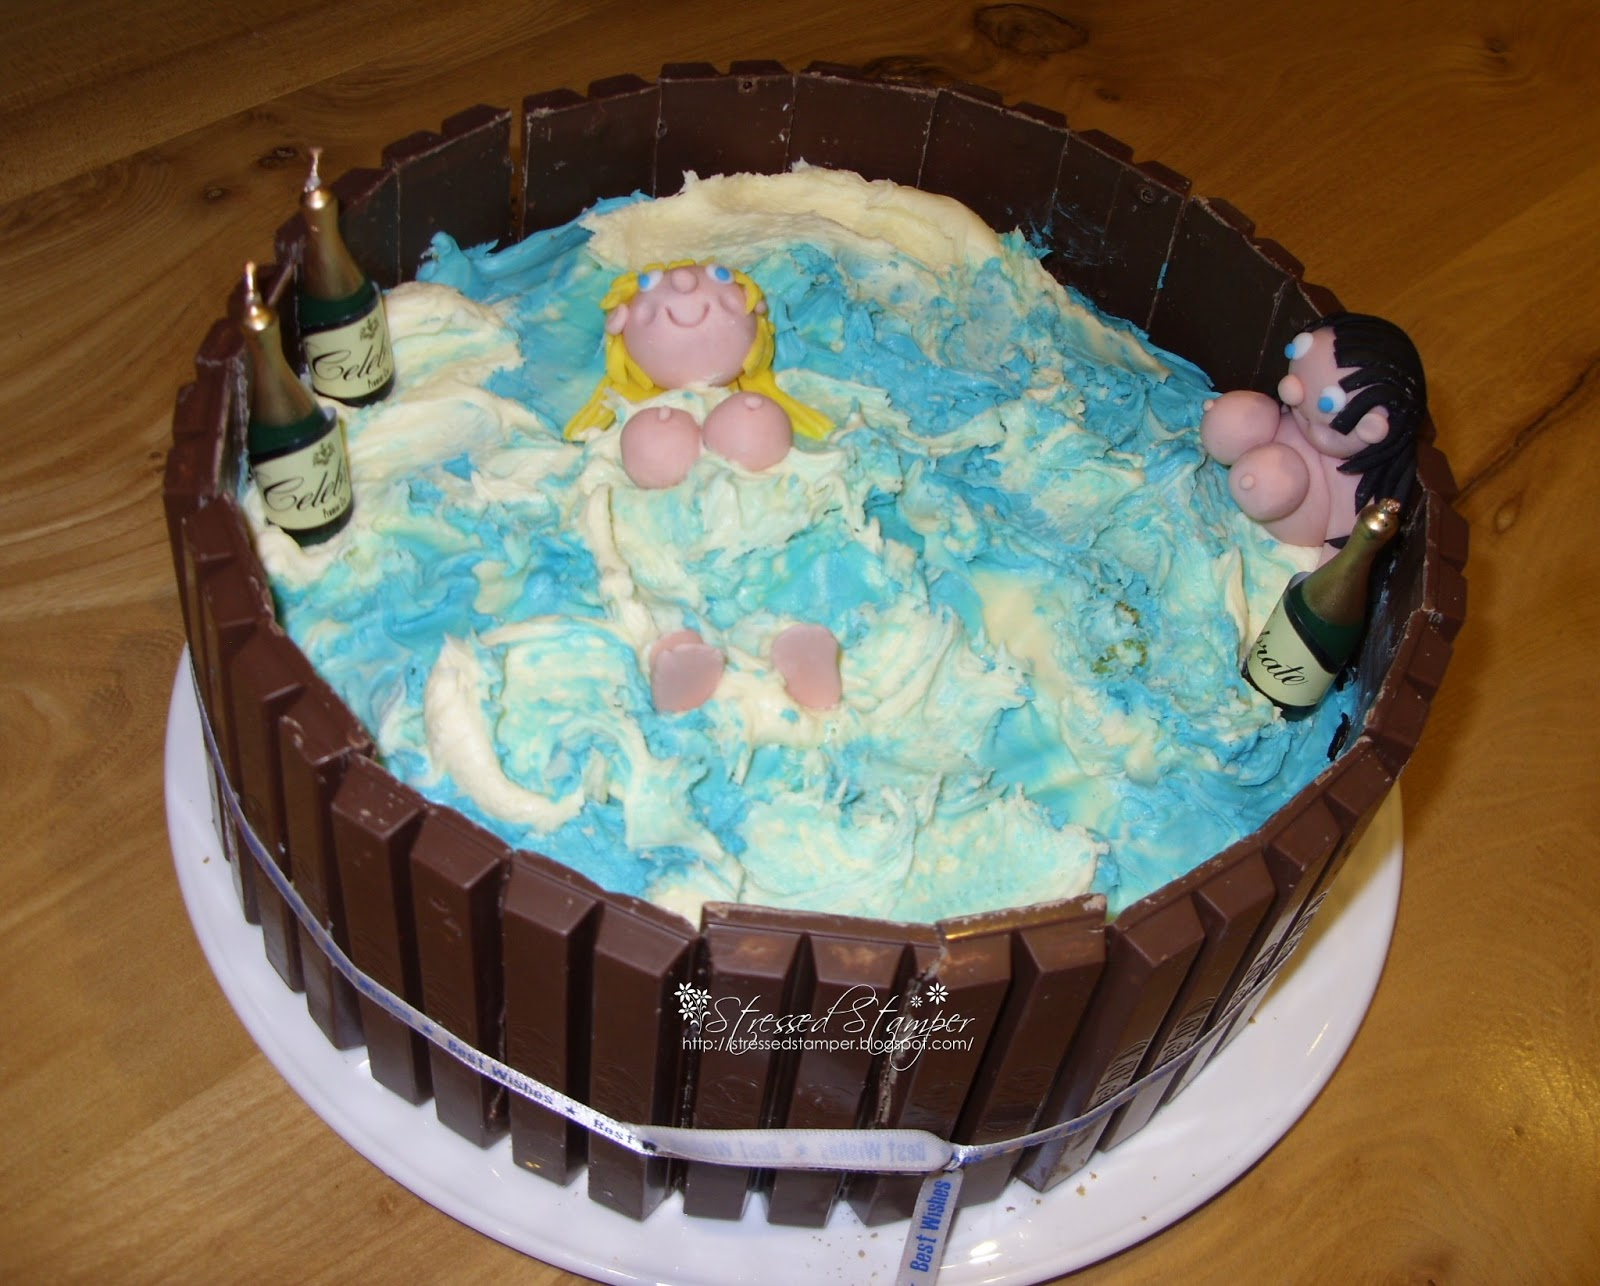 Patel cakes of naked women